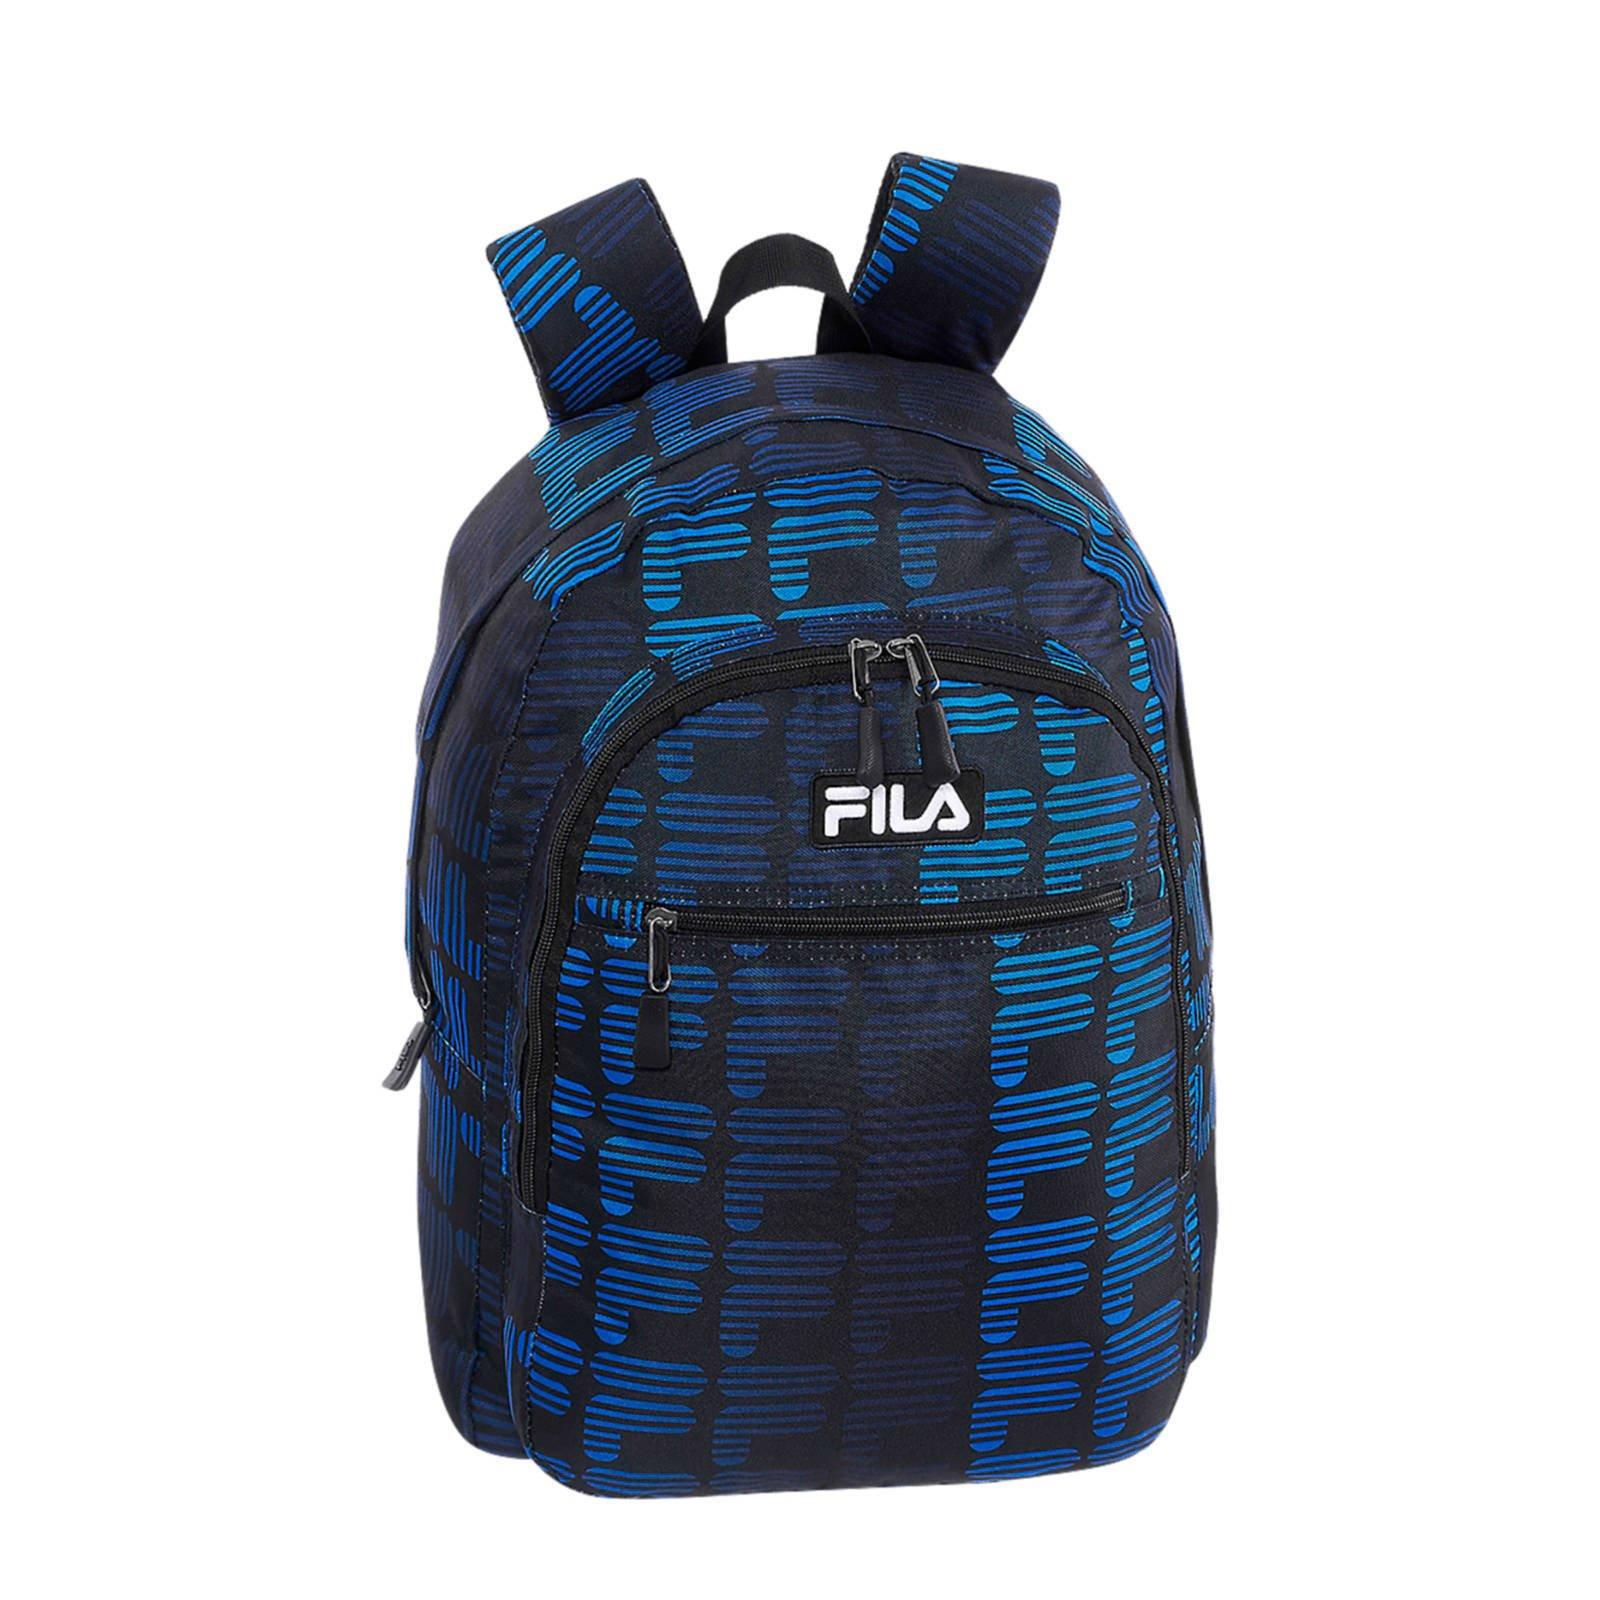 Zwarte rugtas blauw detail Fila maat